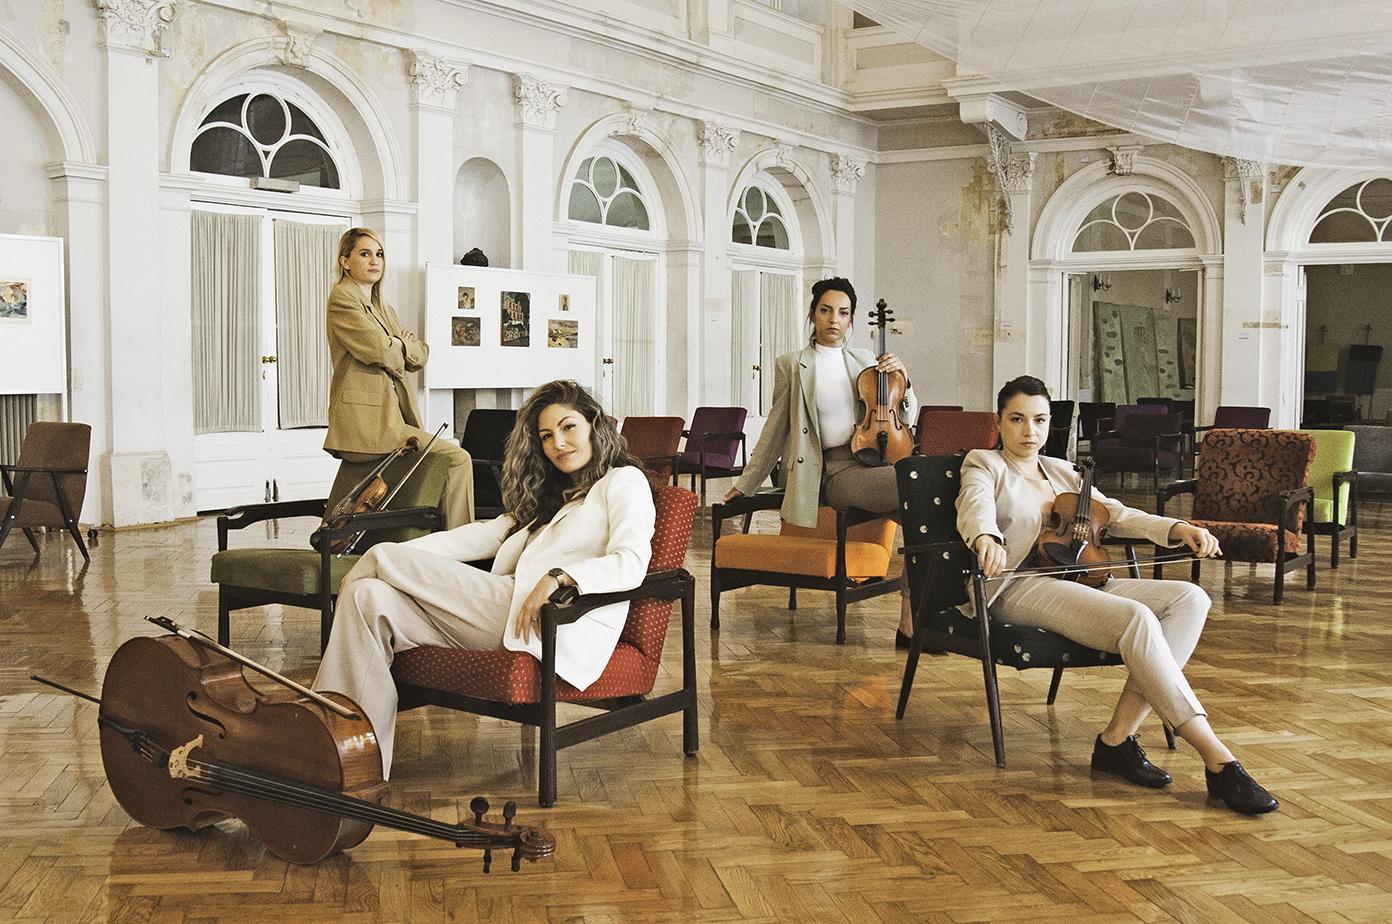 Kvartet Vortex Strings priprema koncert u Hrvatskom glazbenom zavodu